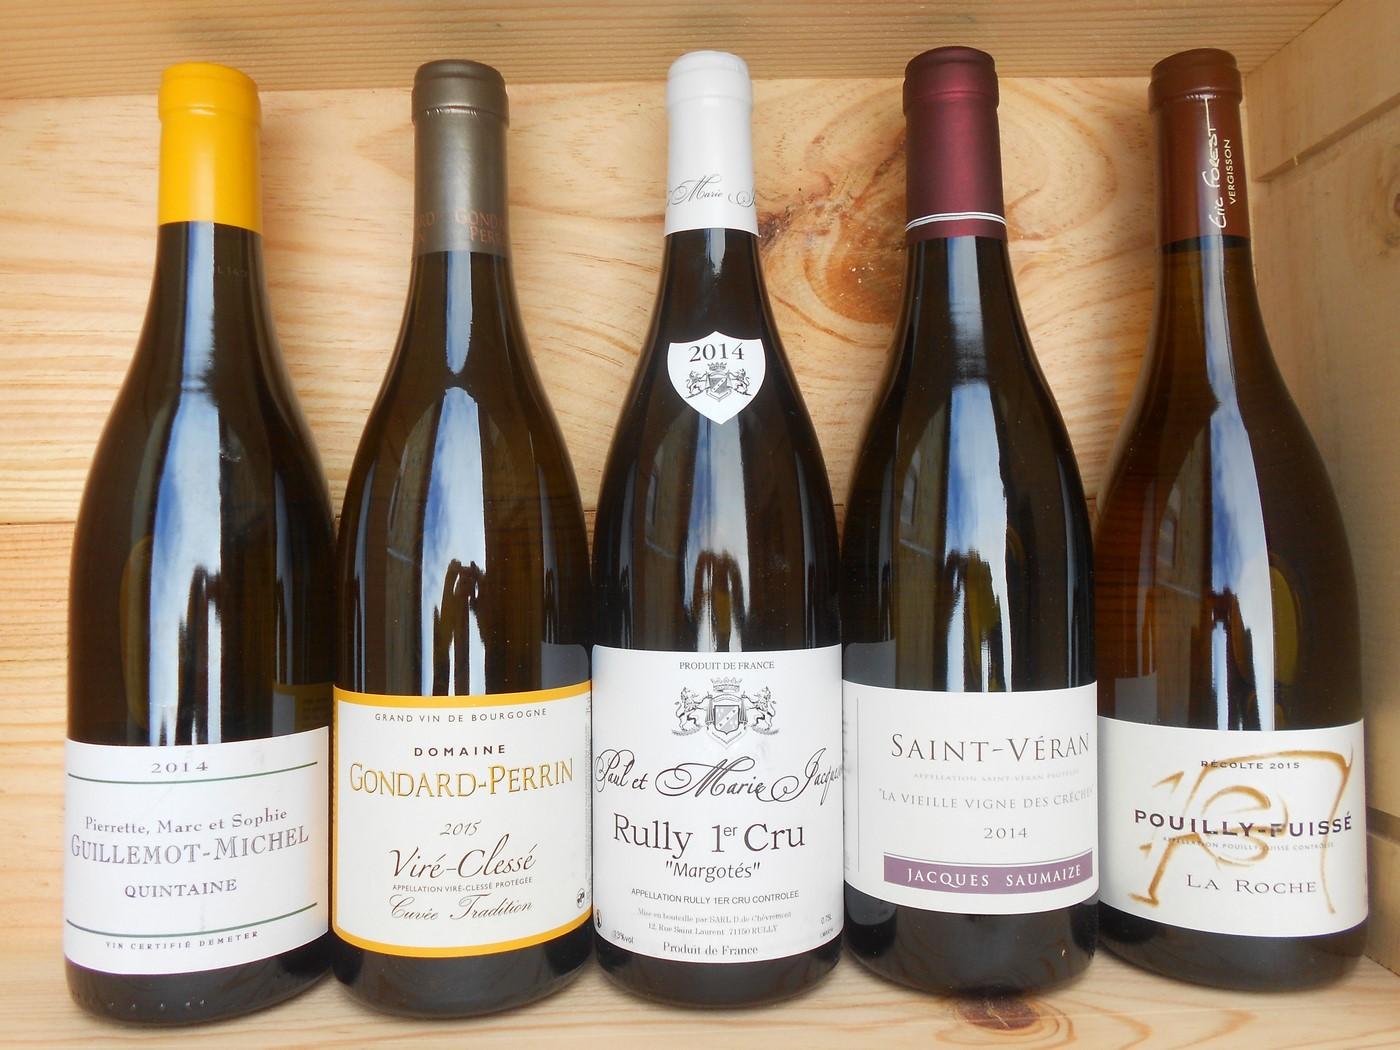 Un échantillon de nos vins proposés